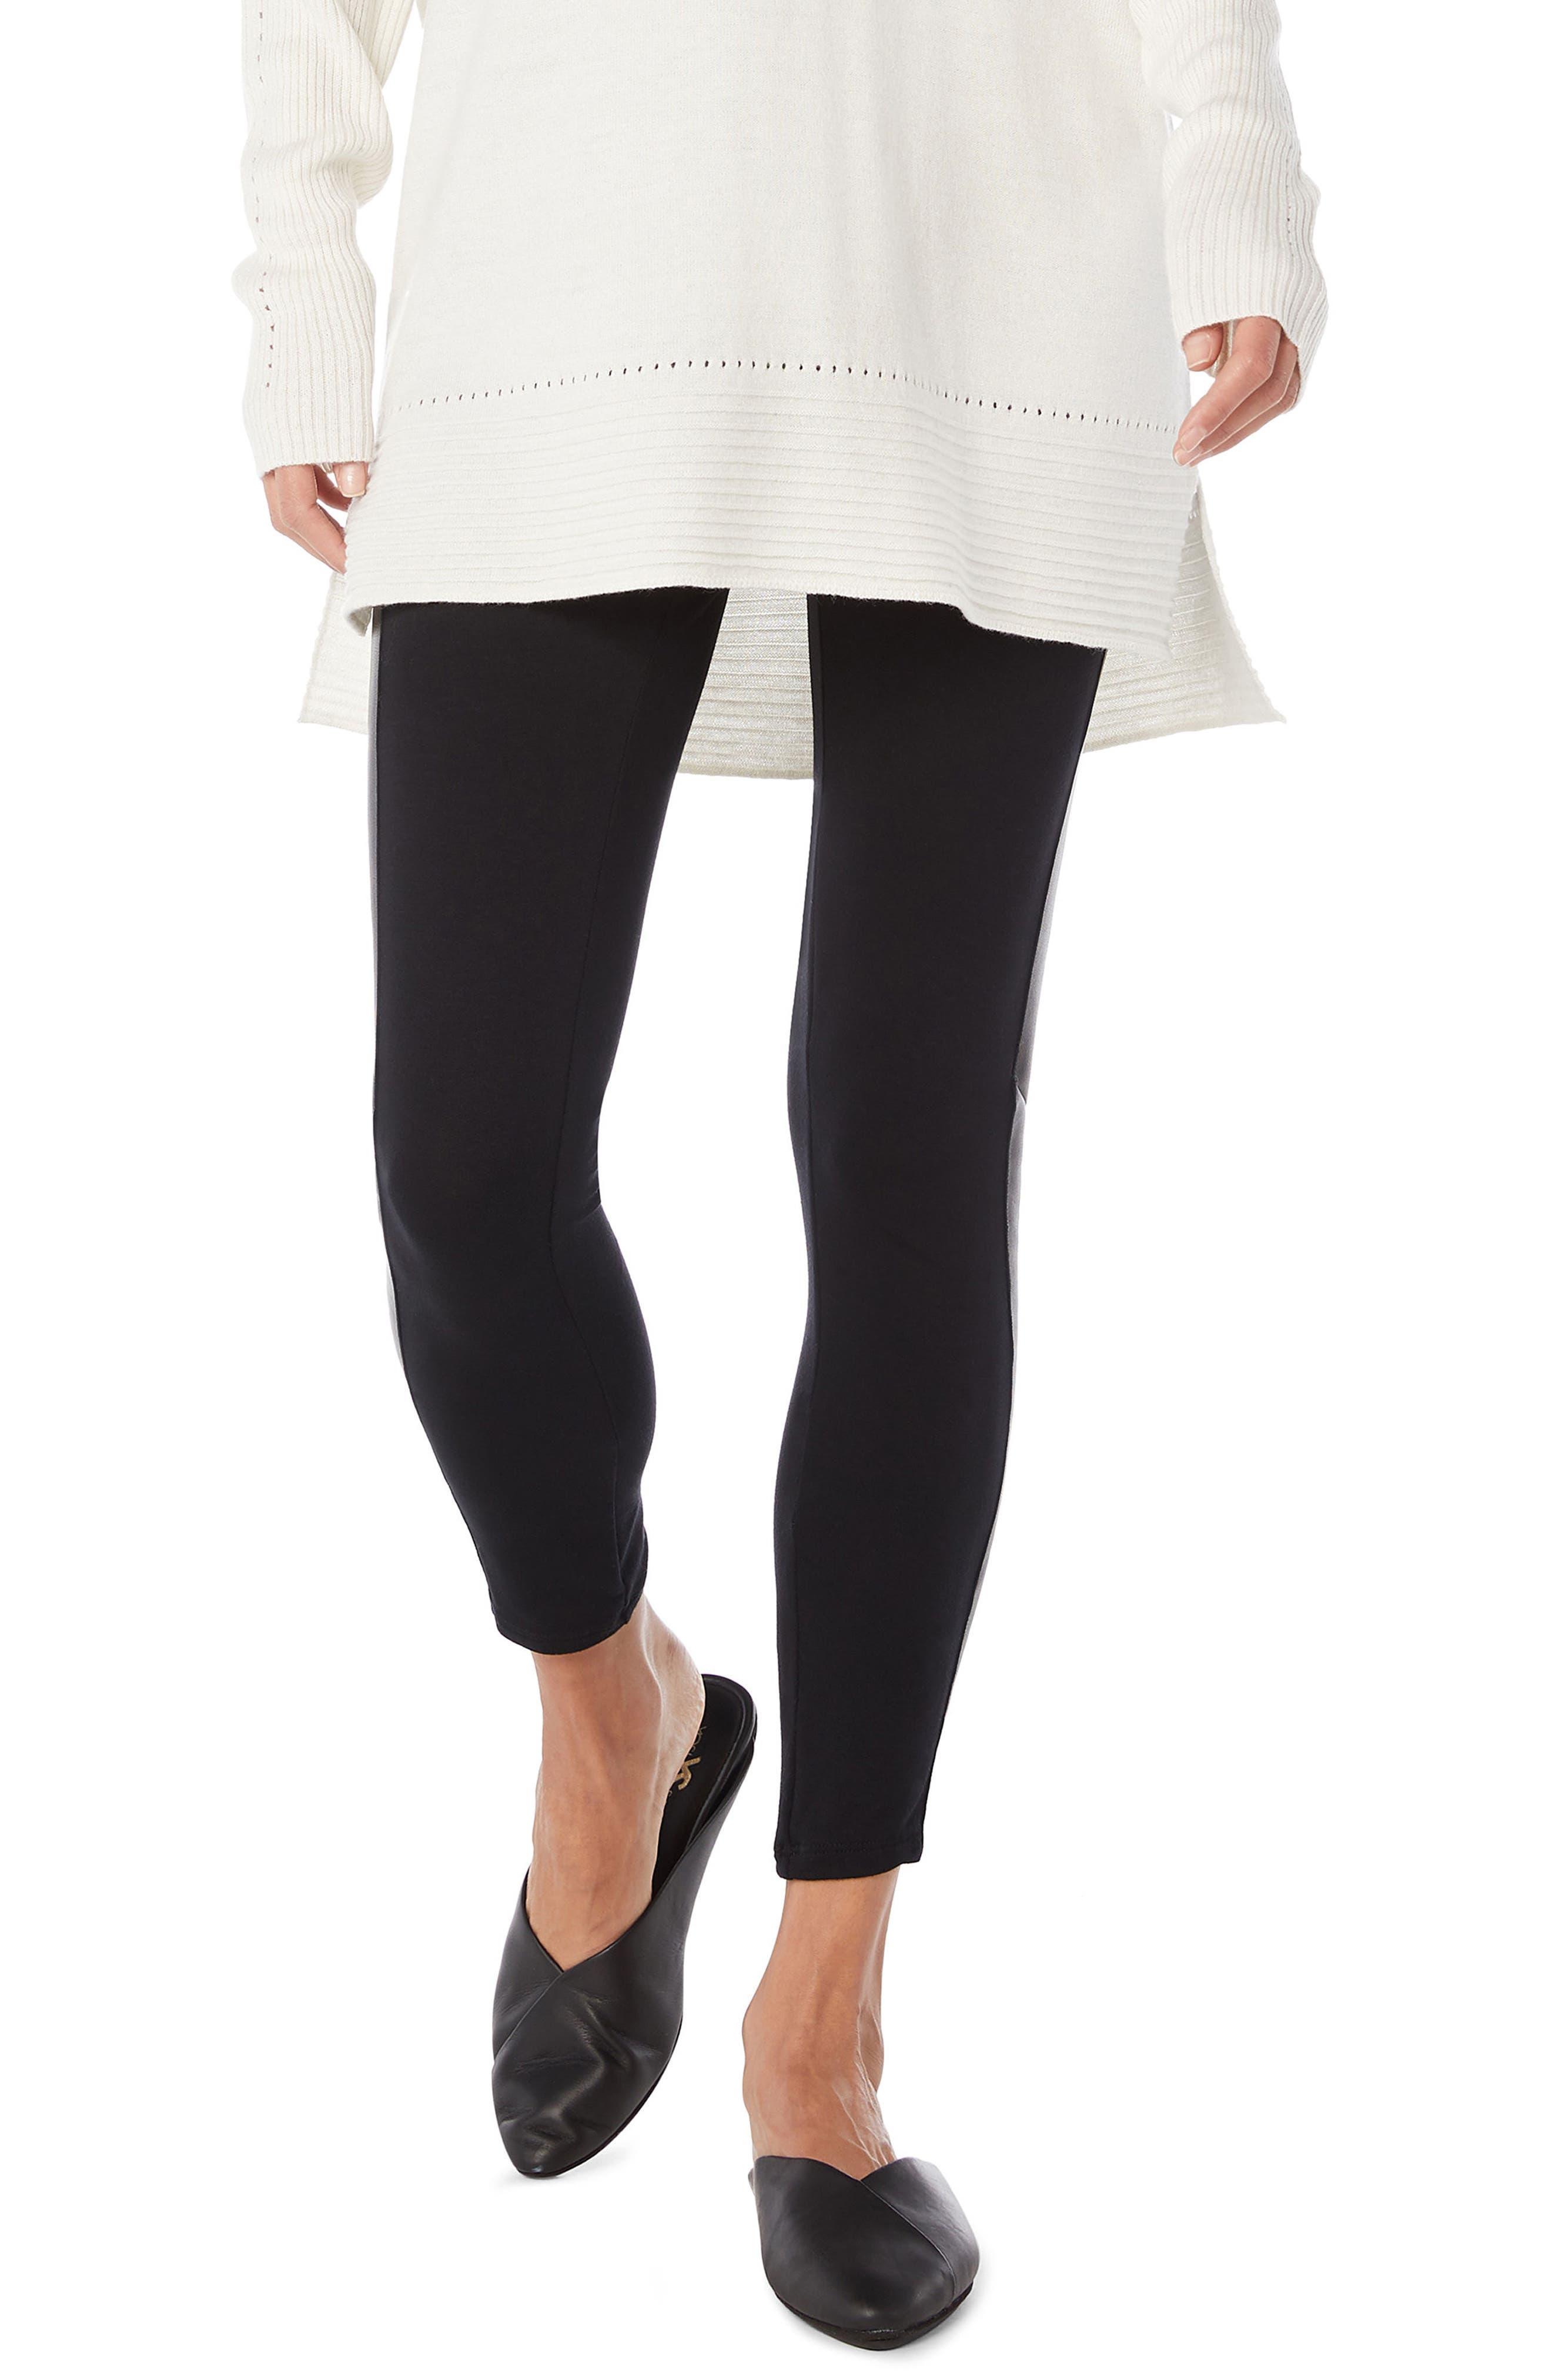 MICHAEL STARS Tuxedo Stripe Leggings, Main, color, BLACK/ BLACK